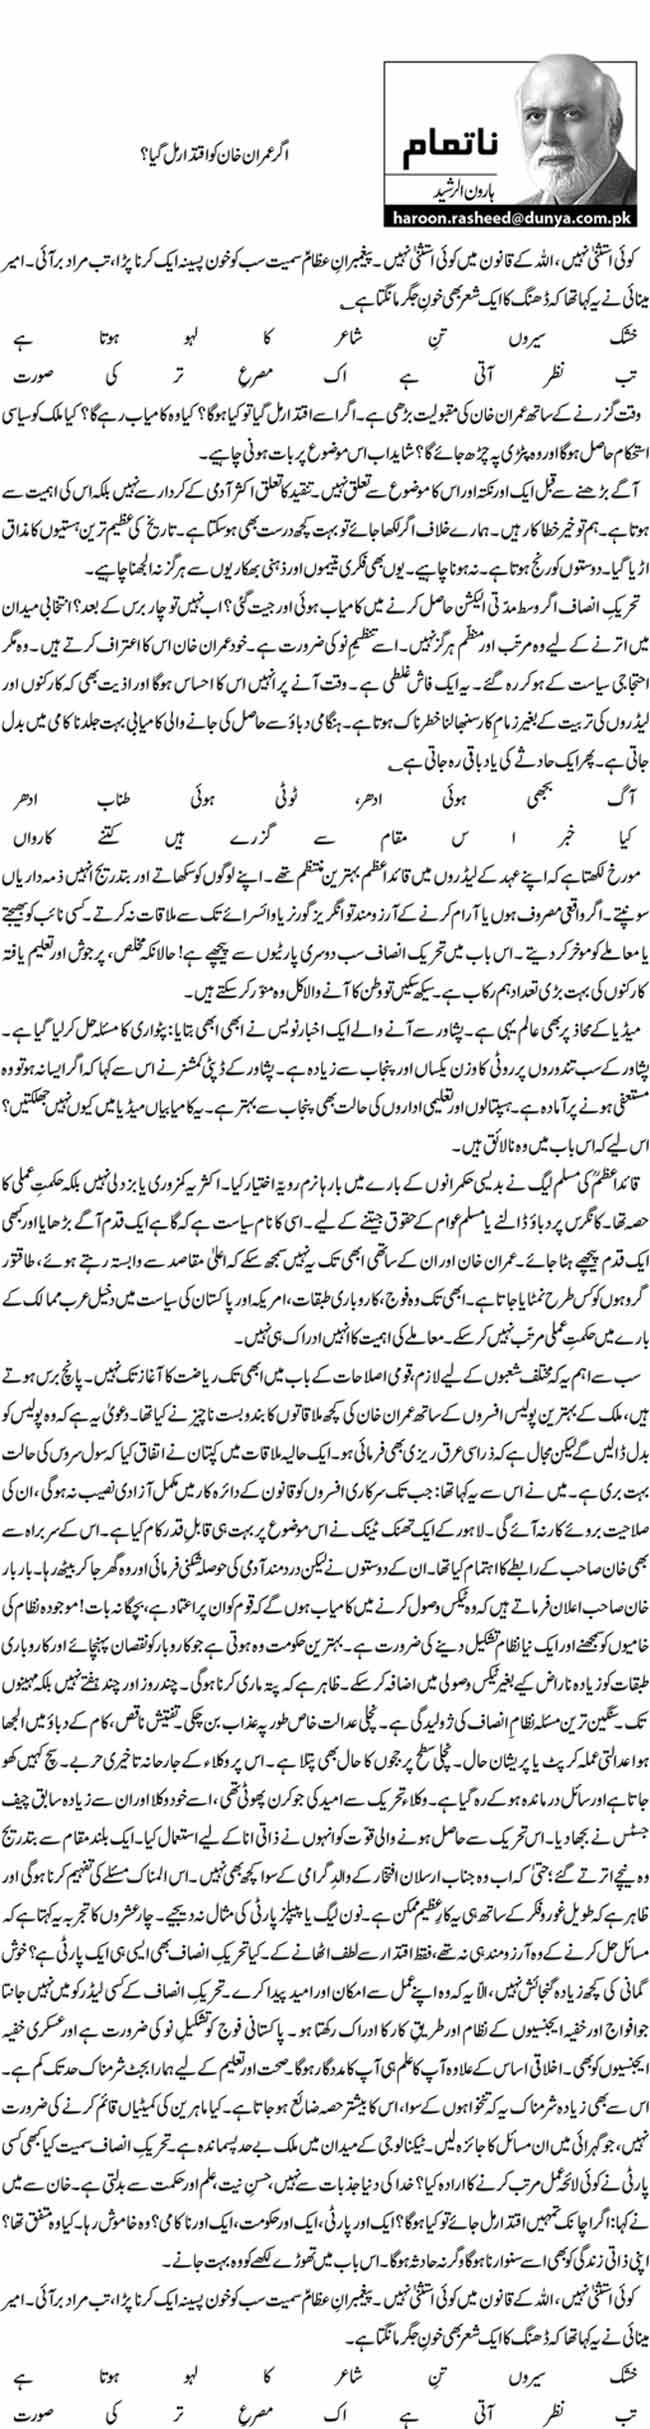 اگر عمران خان کو اقتدار مل گیا؟